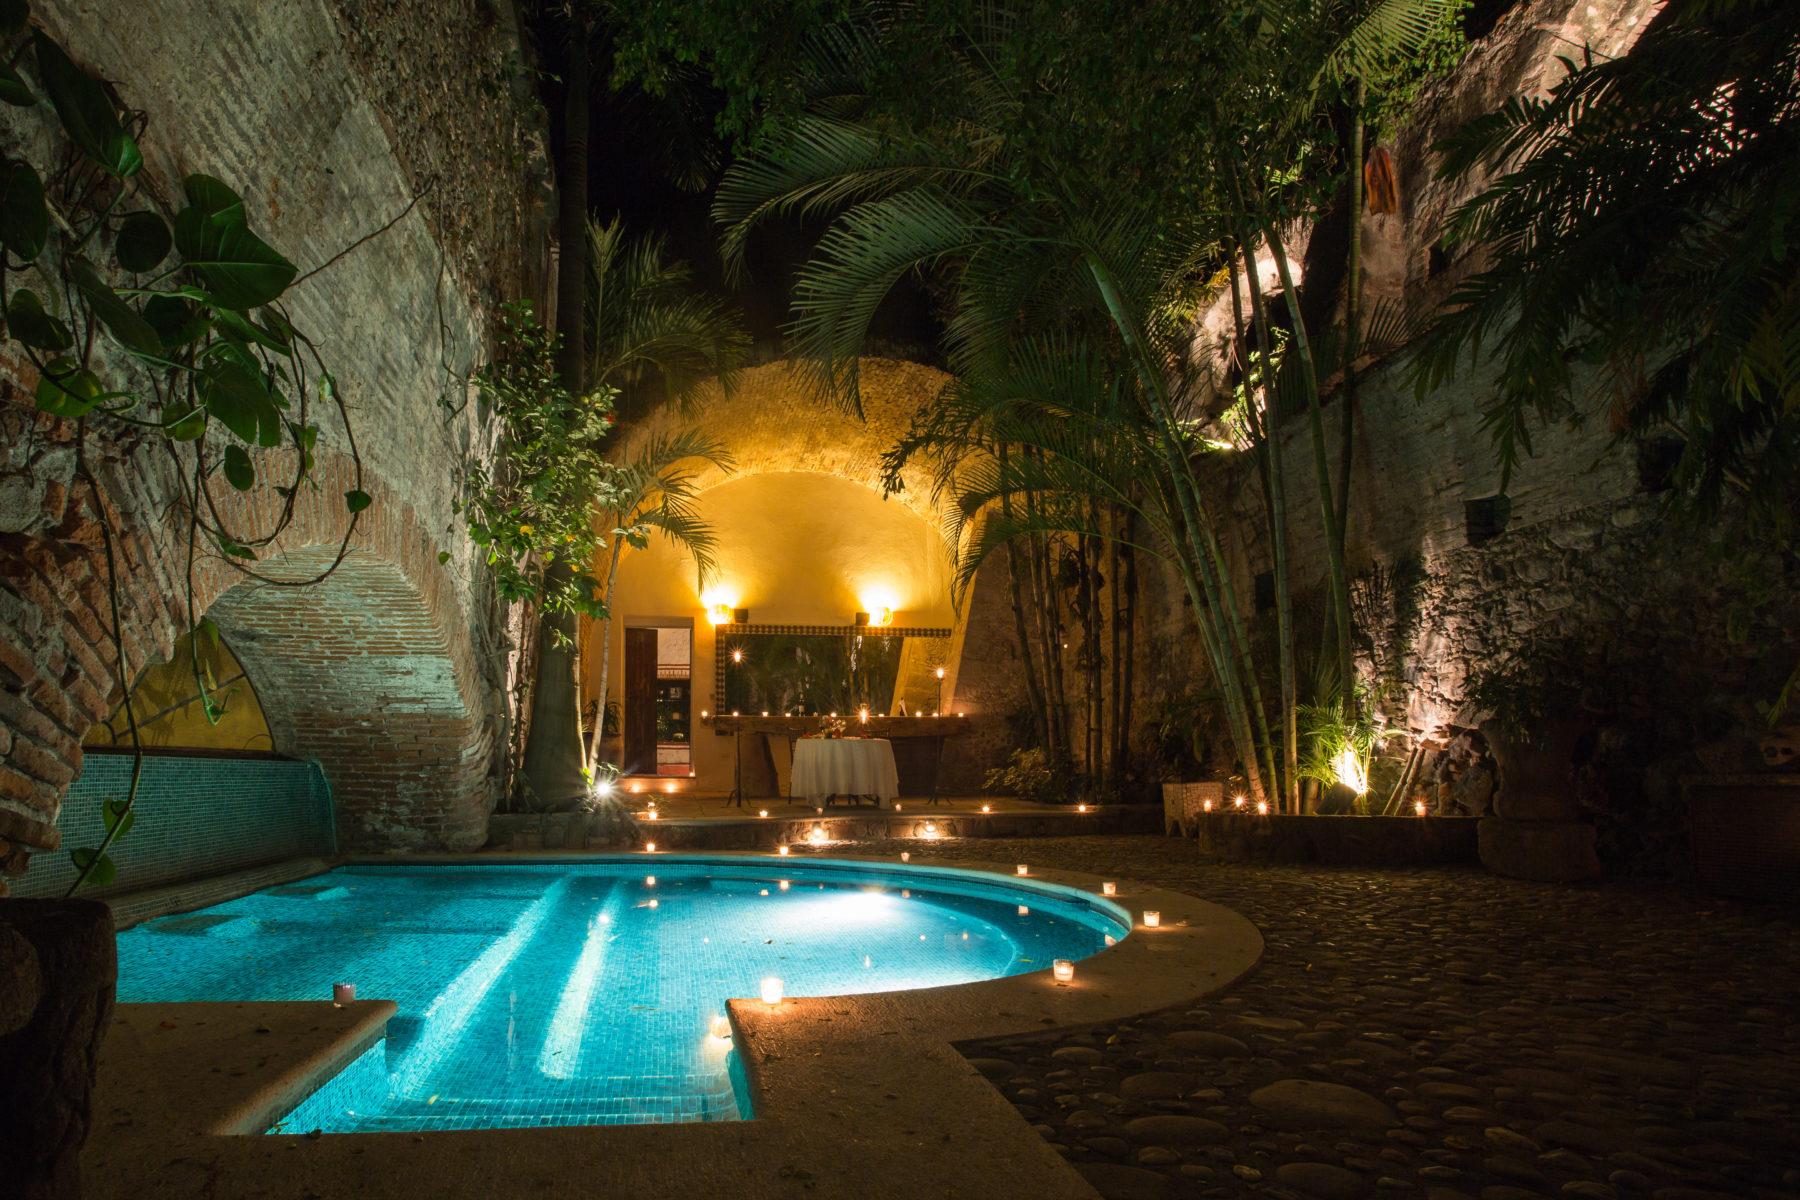 Hacienda San Gabriel de Las Palmas: la gloria en la Tierra